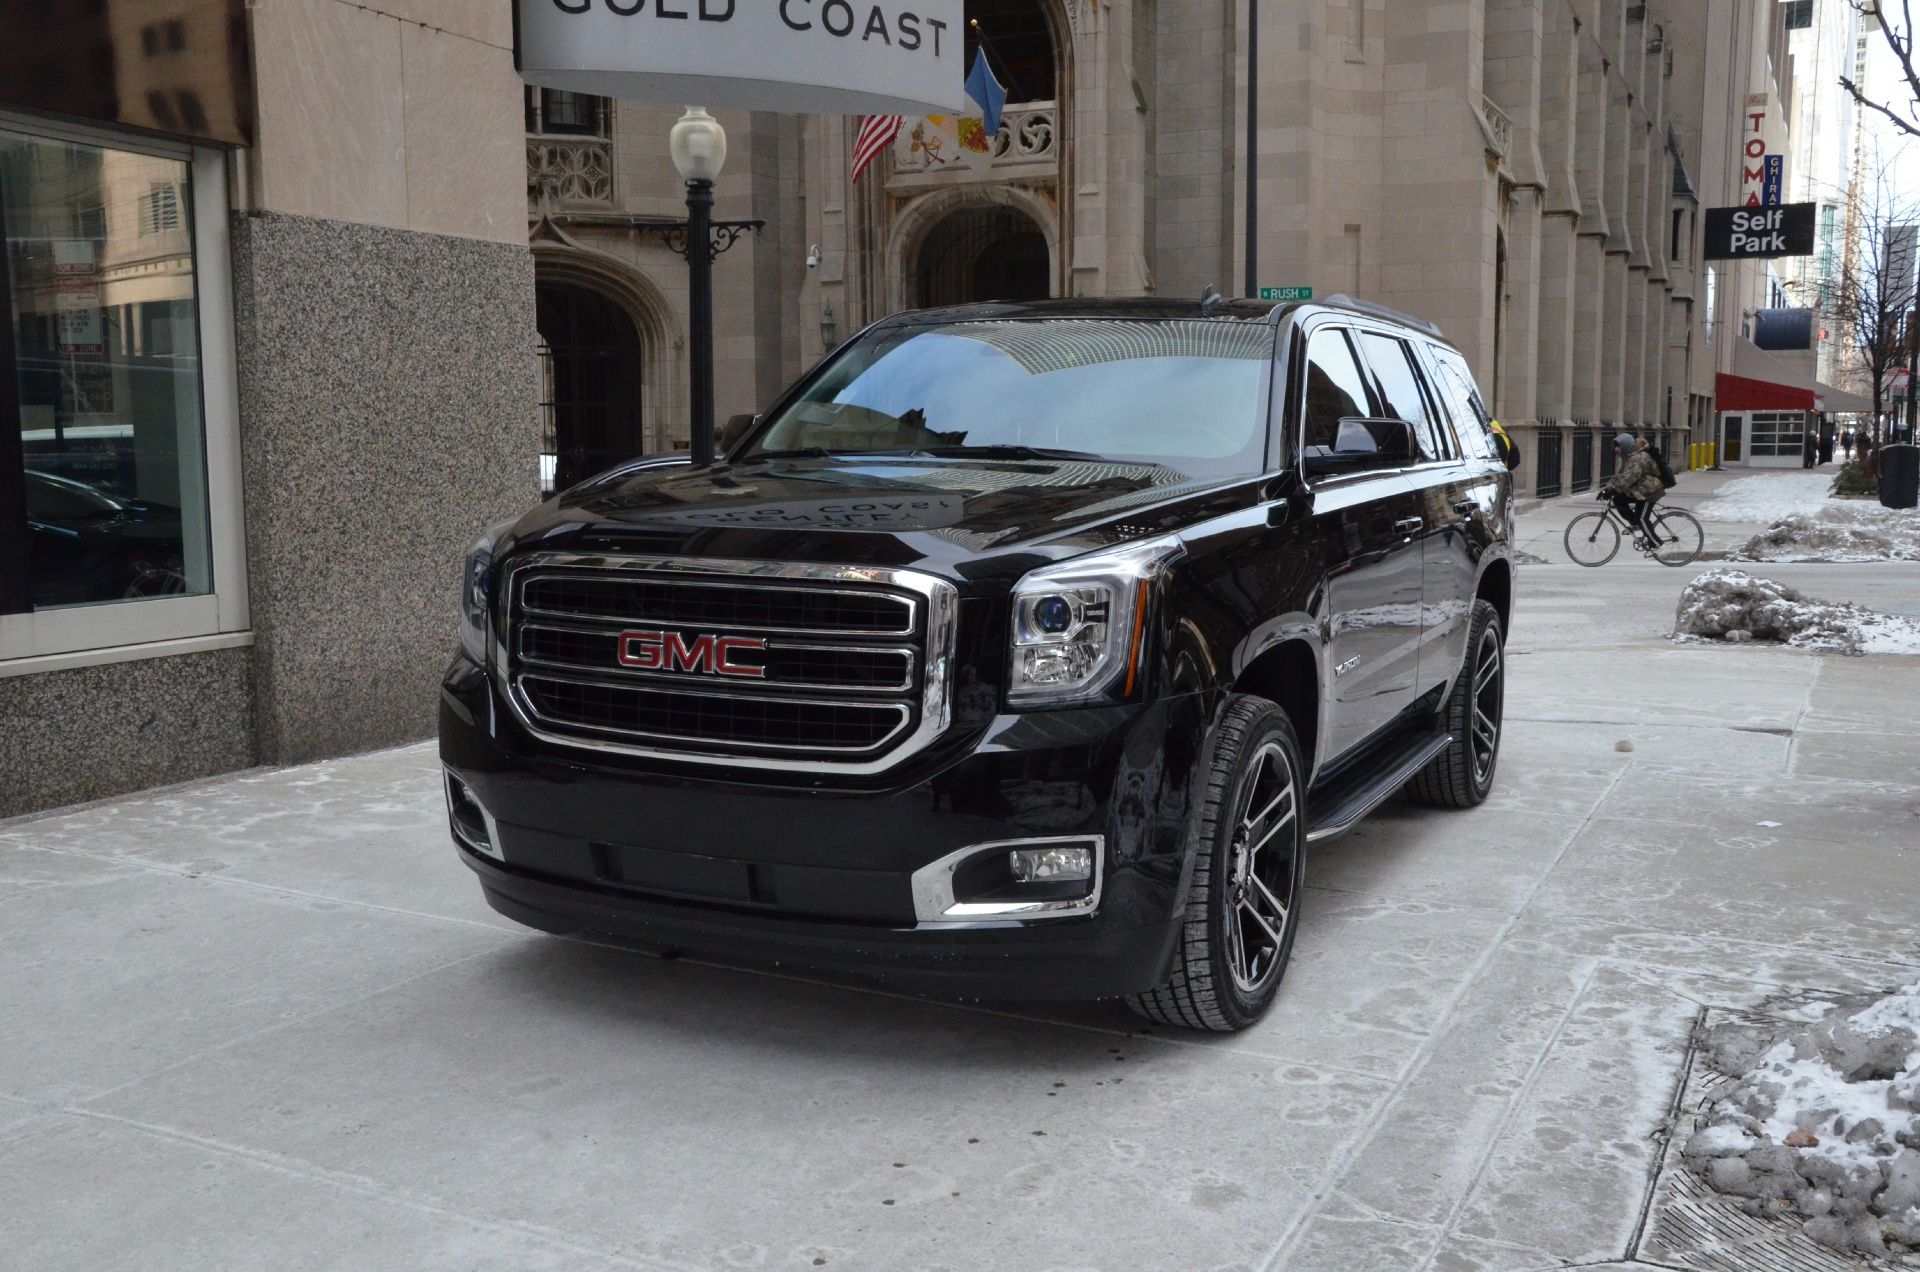 2015 Gmc Yukon Slt Stock Gc1540 For Sale Near Chicago